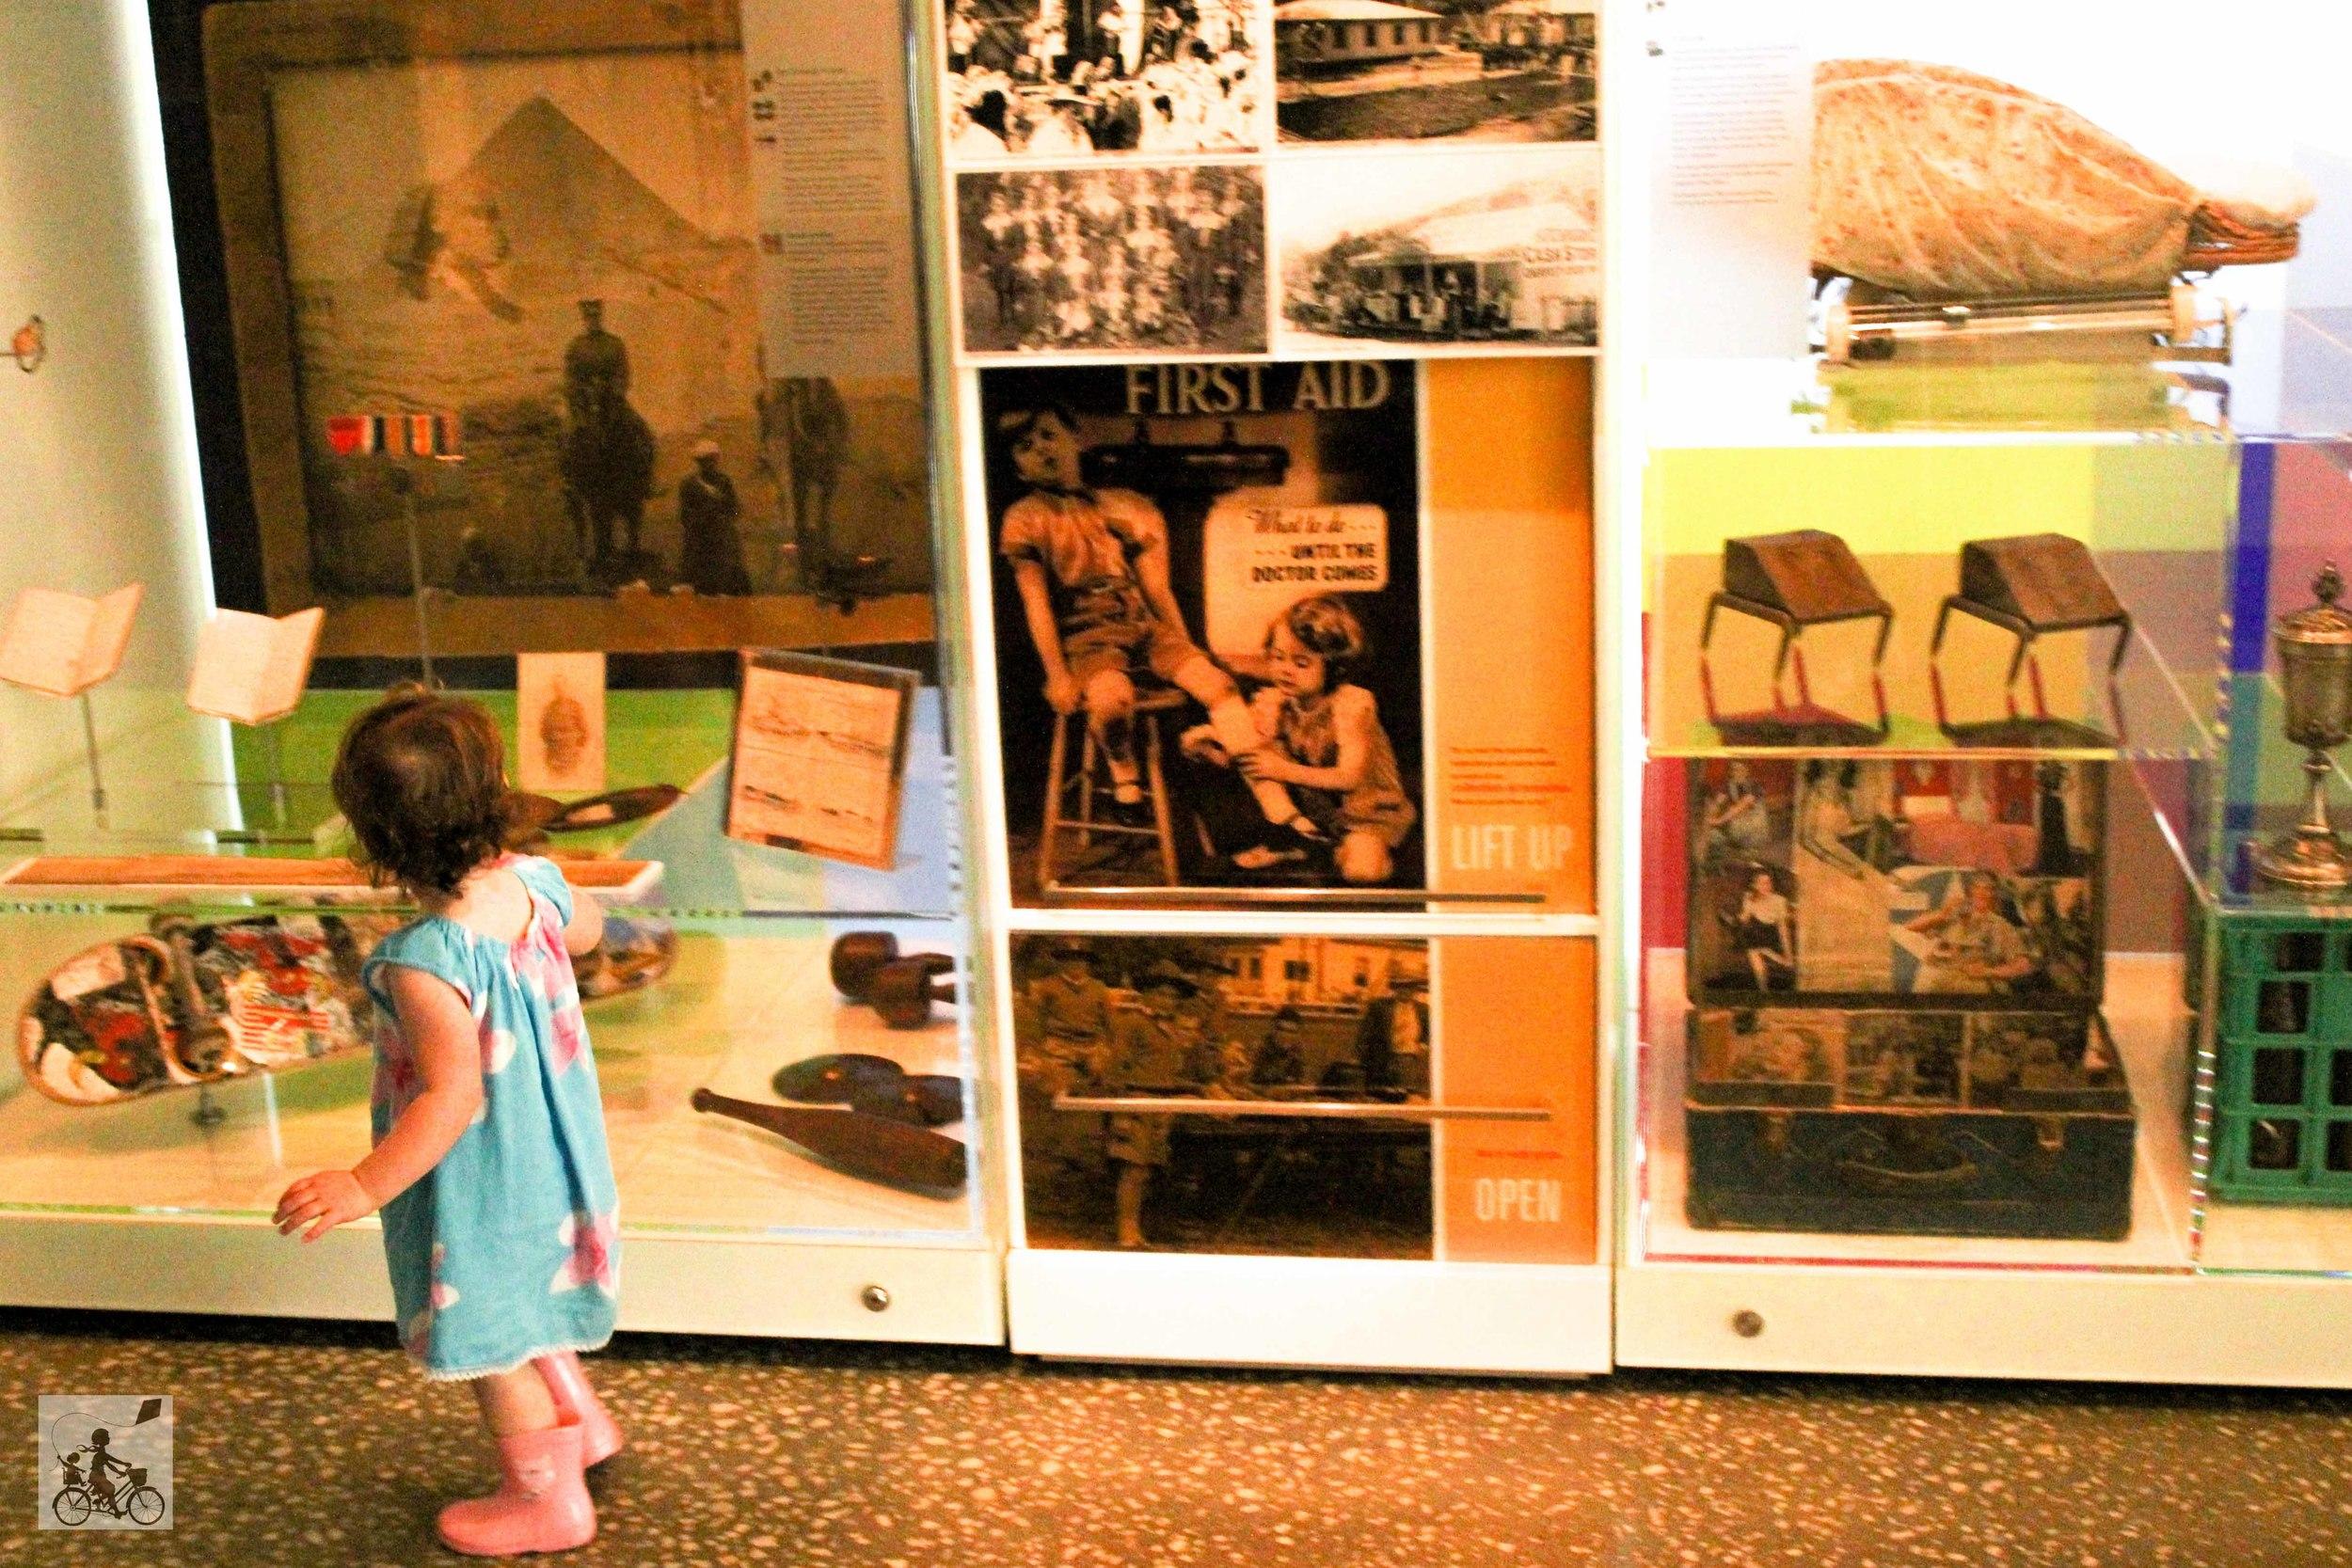 Mamma Knows East - Yarra Ranges Regional Museum